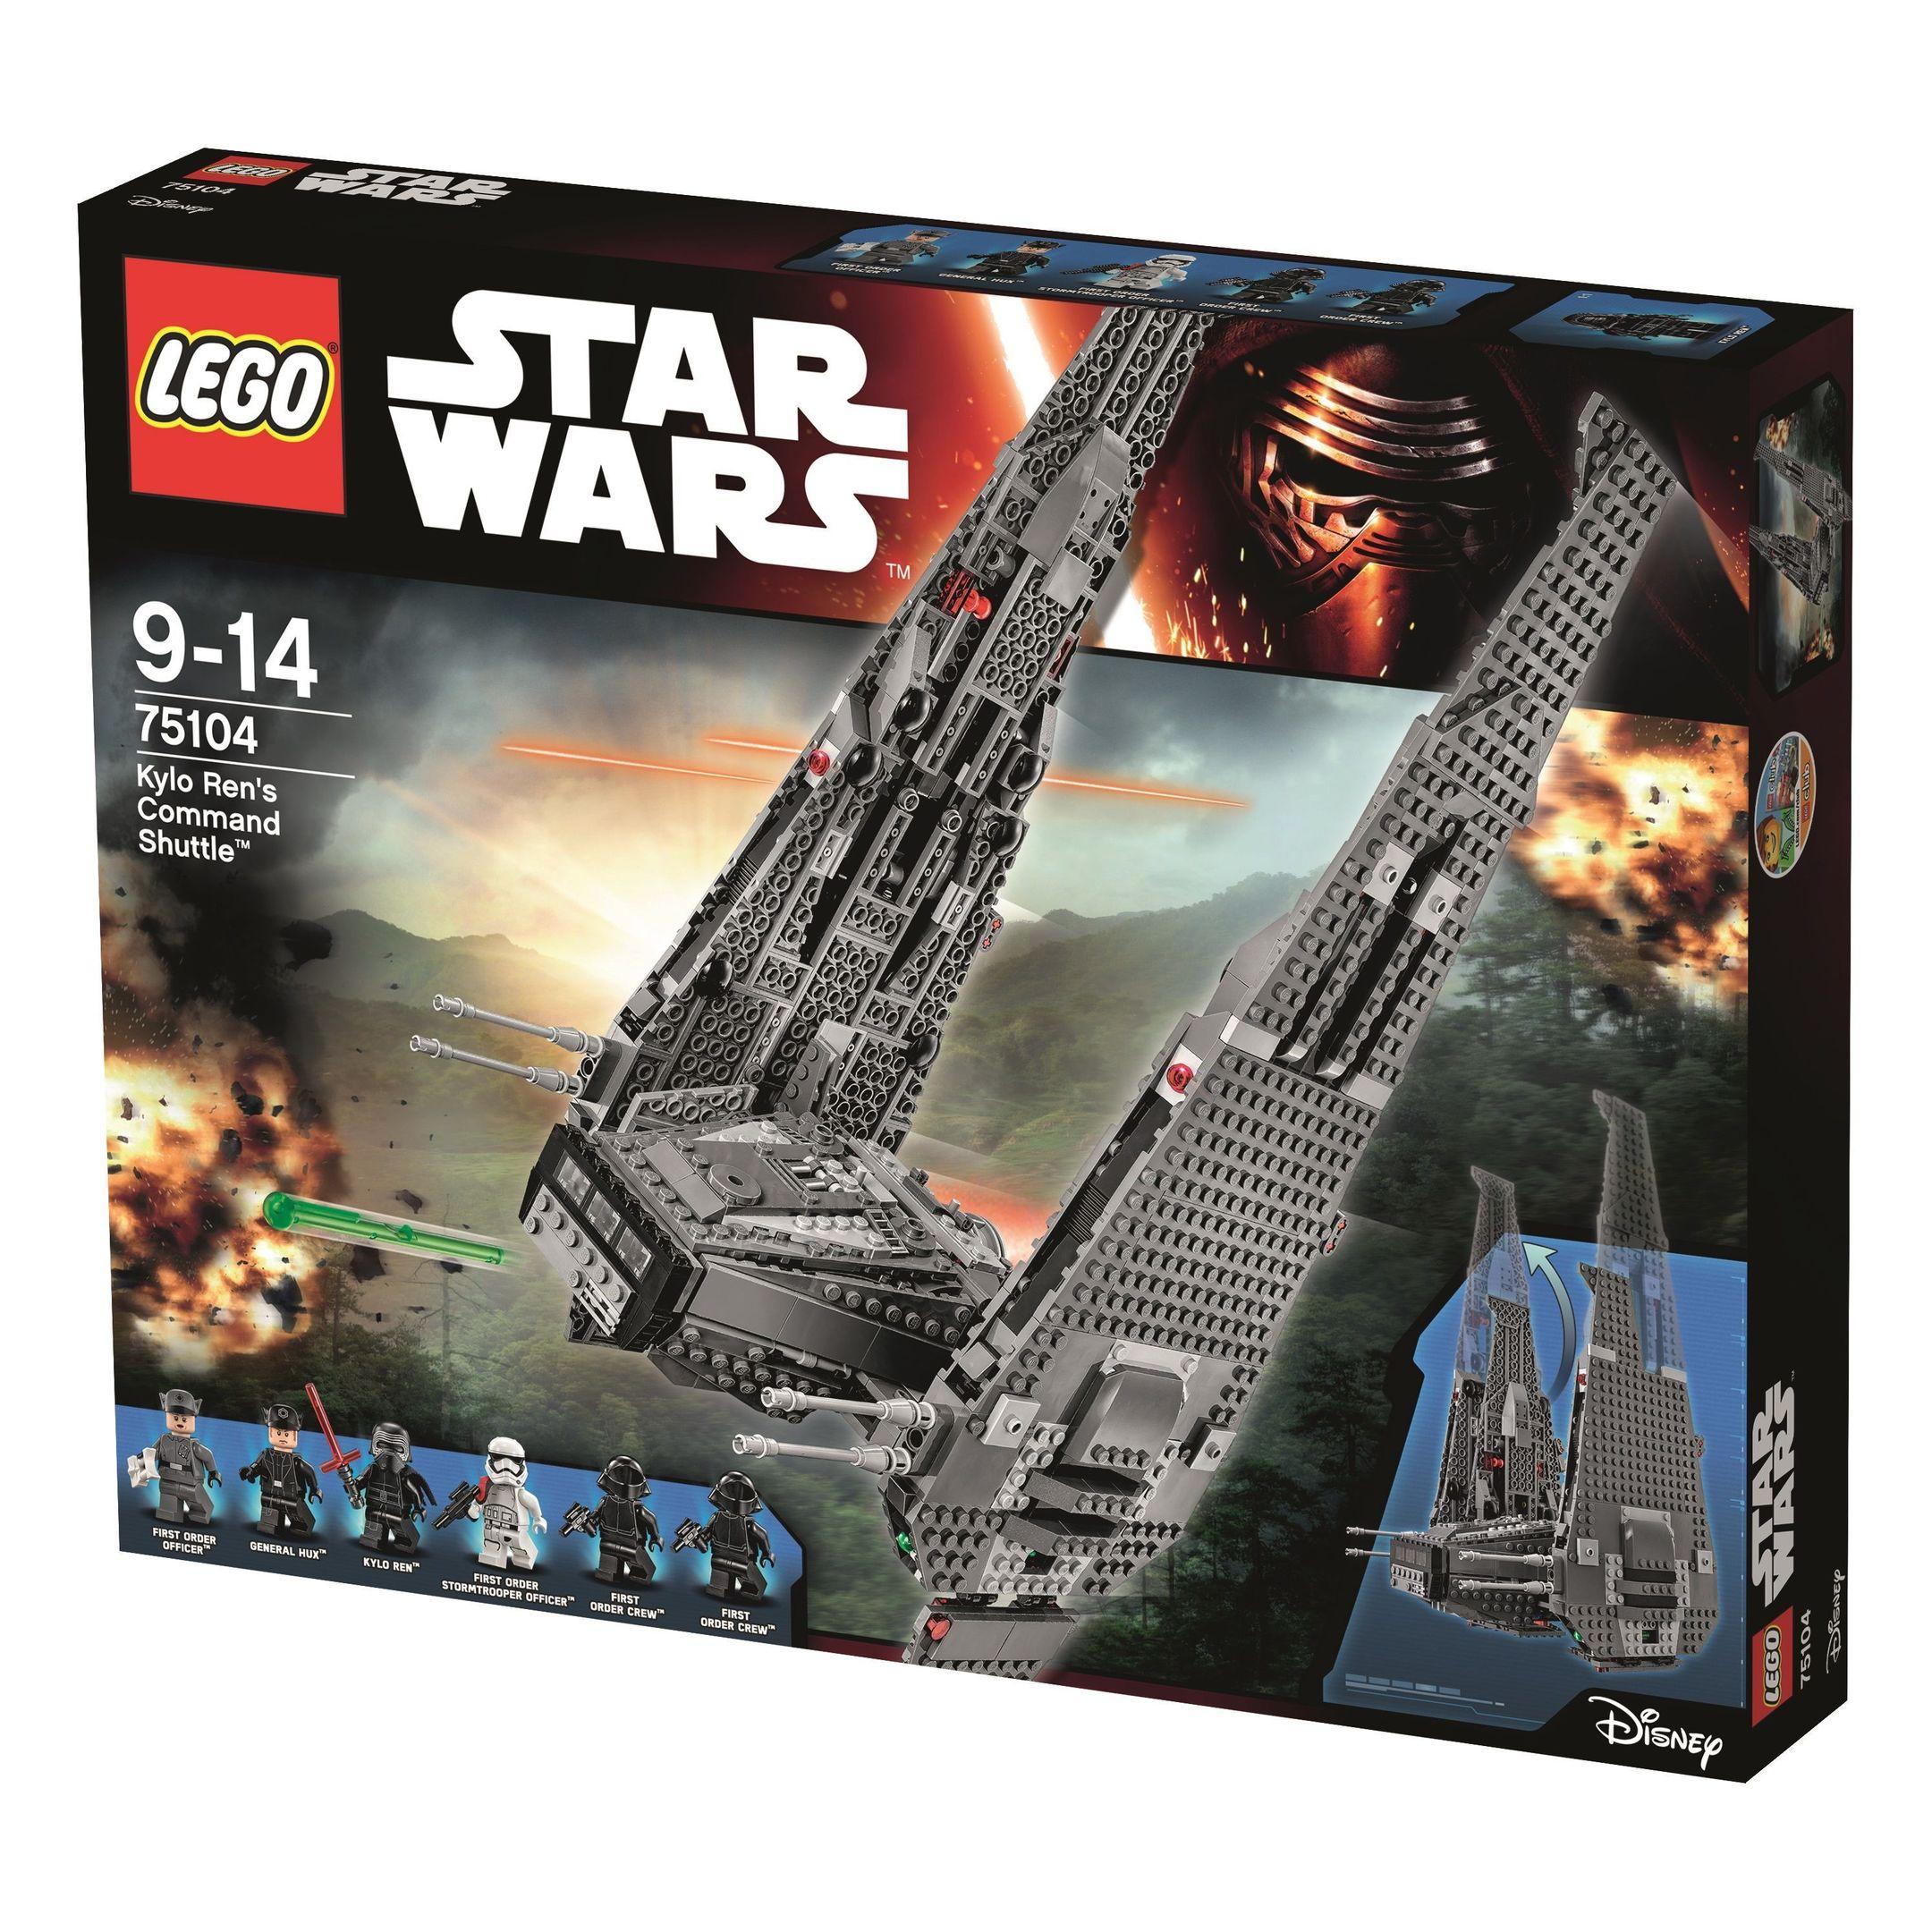 A Star Wars Lego Death Star set will go up by £20.